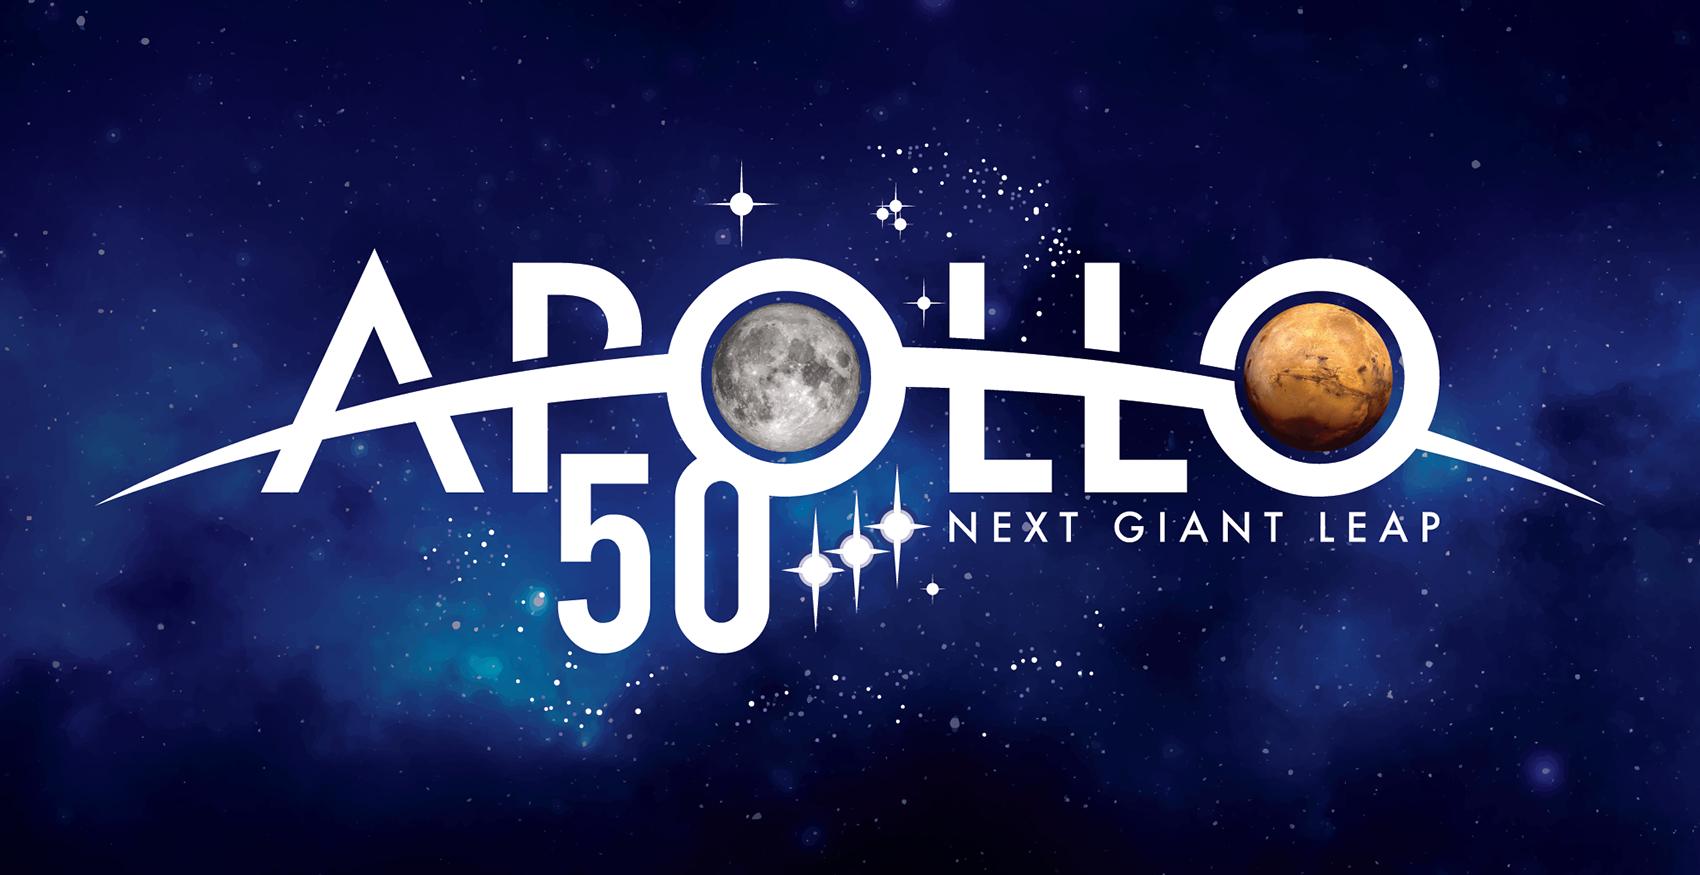 50th anniversary of the Apollo program including the moon landing of Apollo 11th